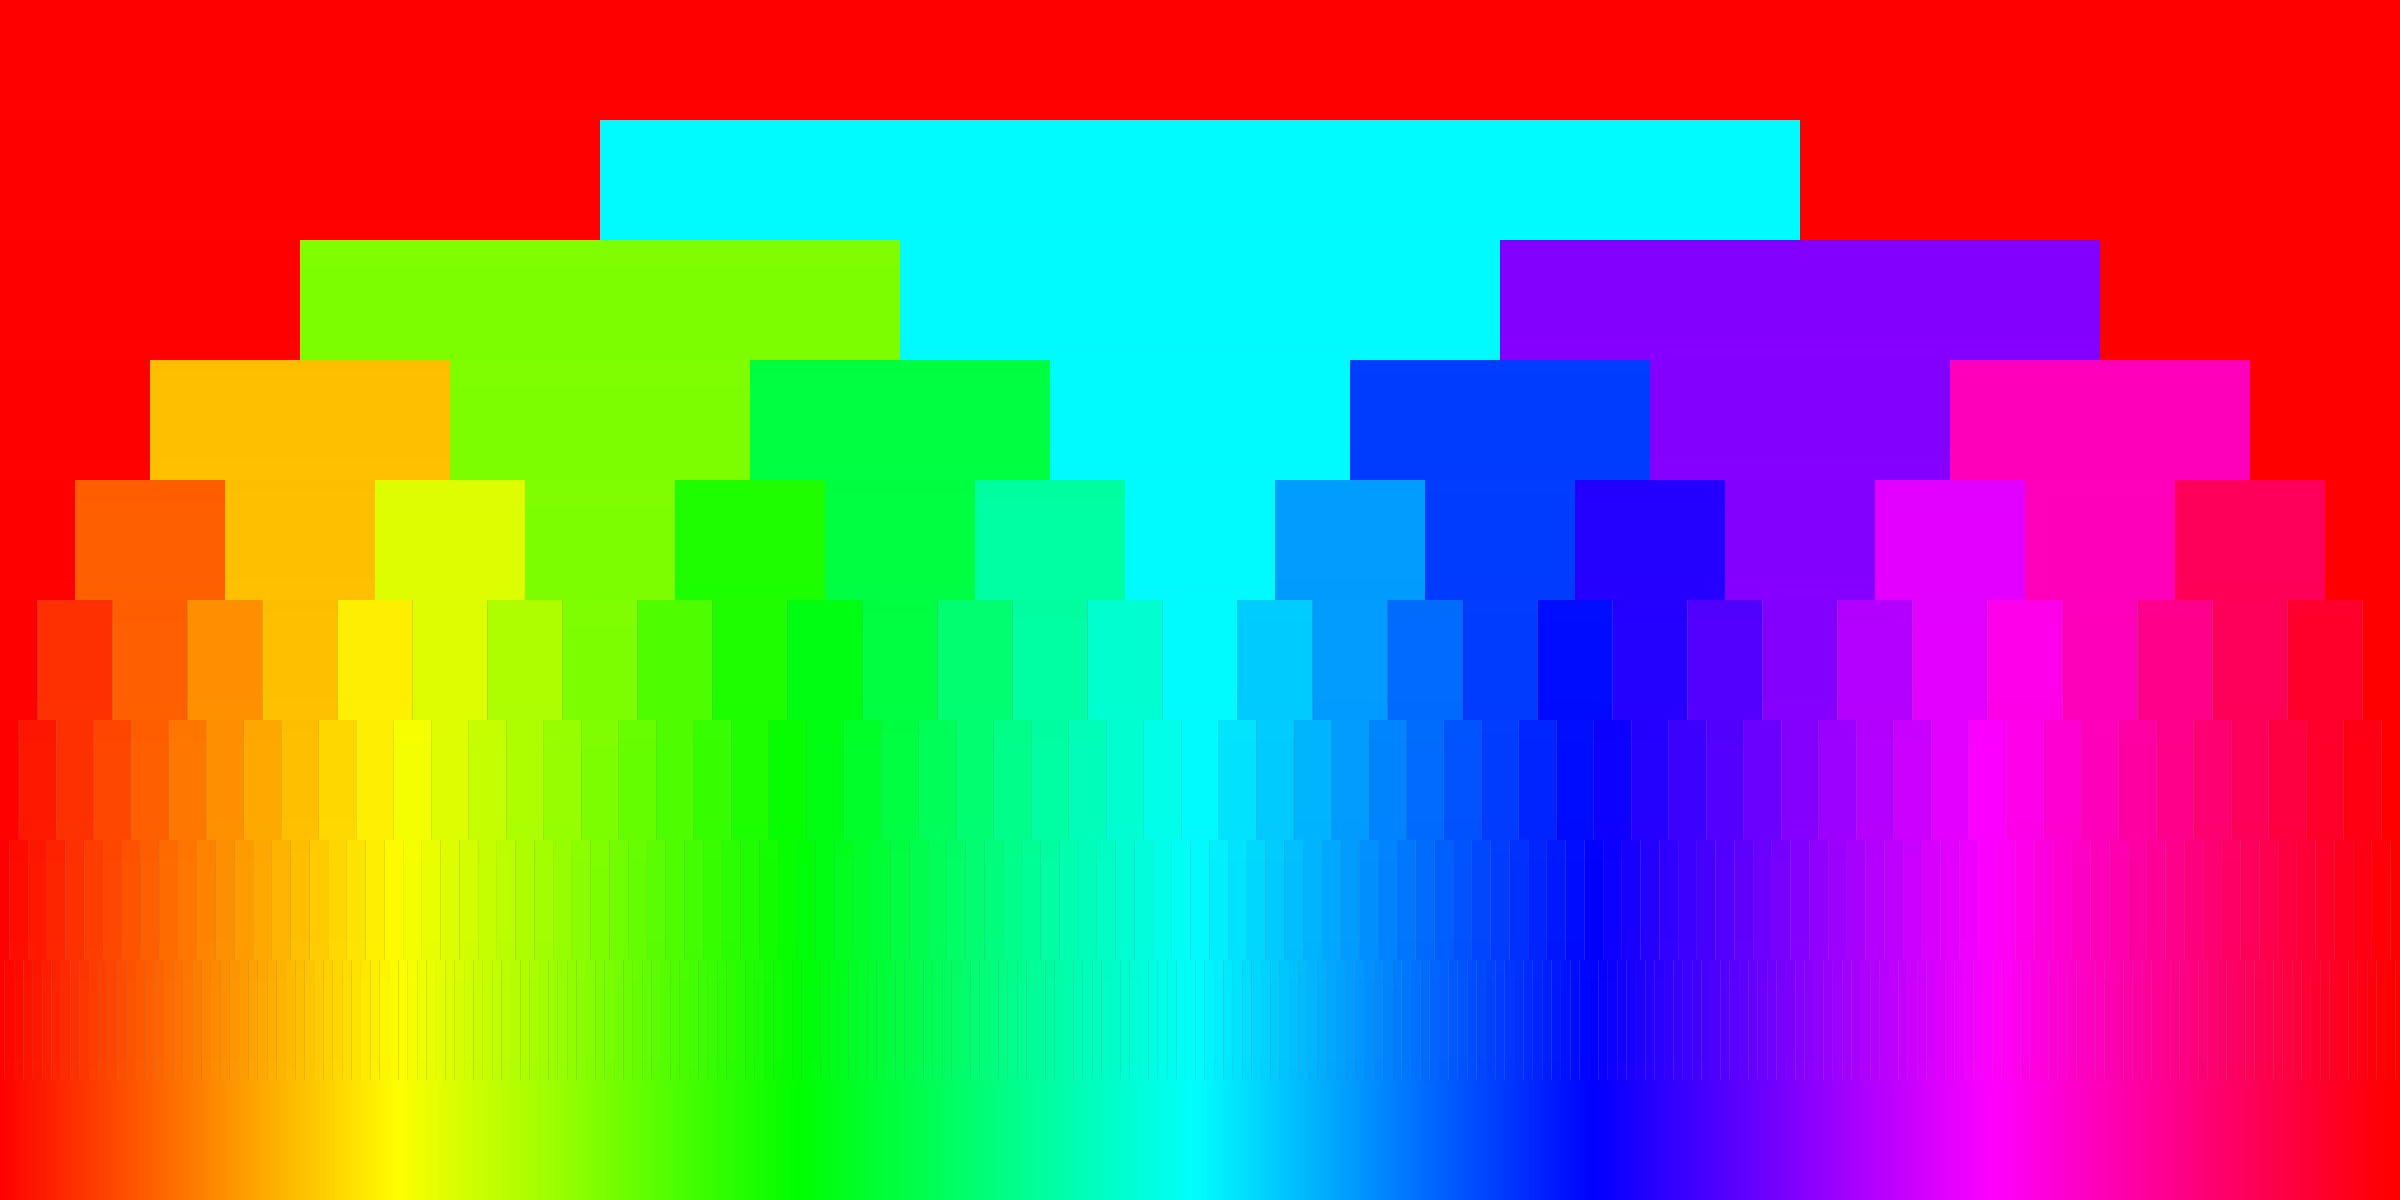 Logarithmic Spectrum Steps 5 By Lazur Urh.